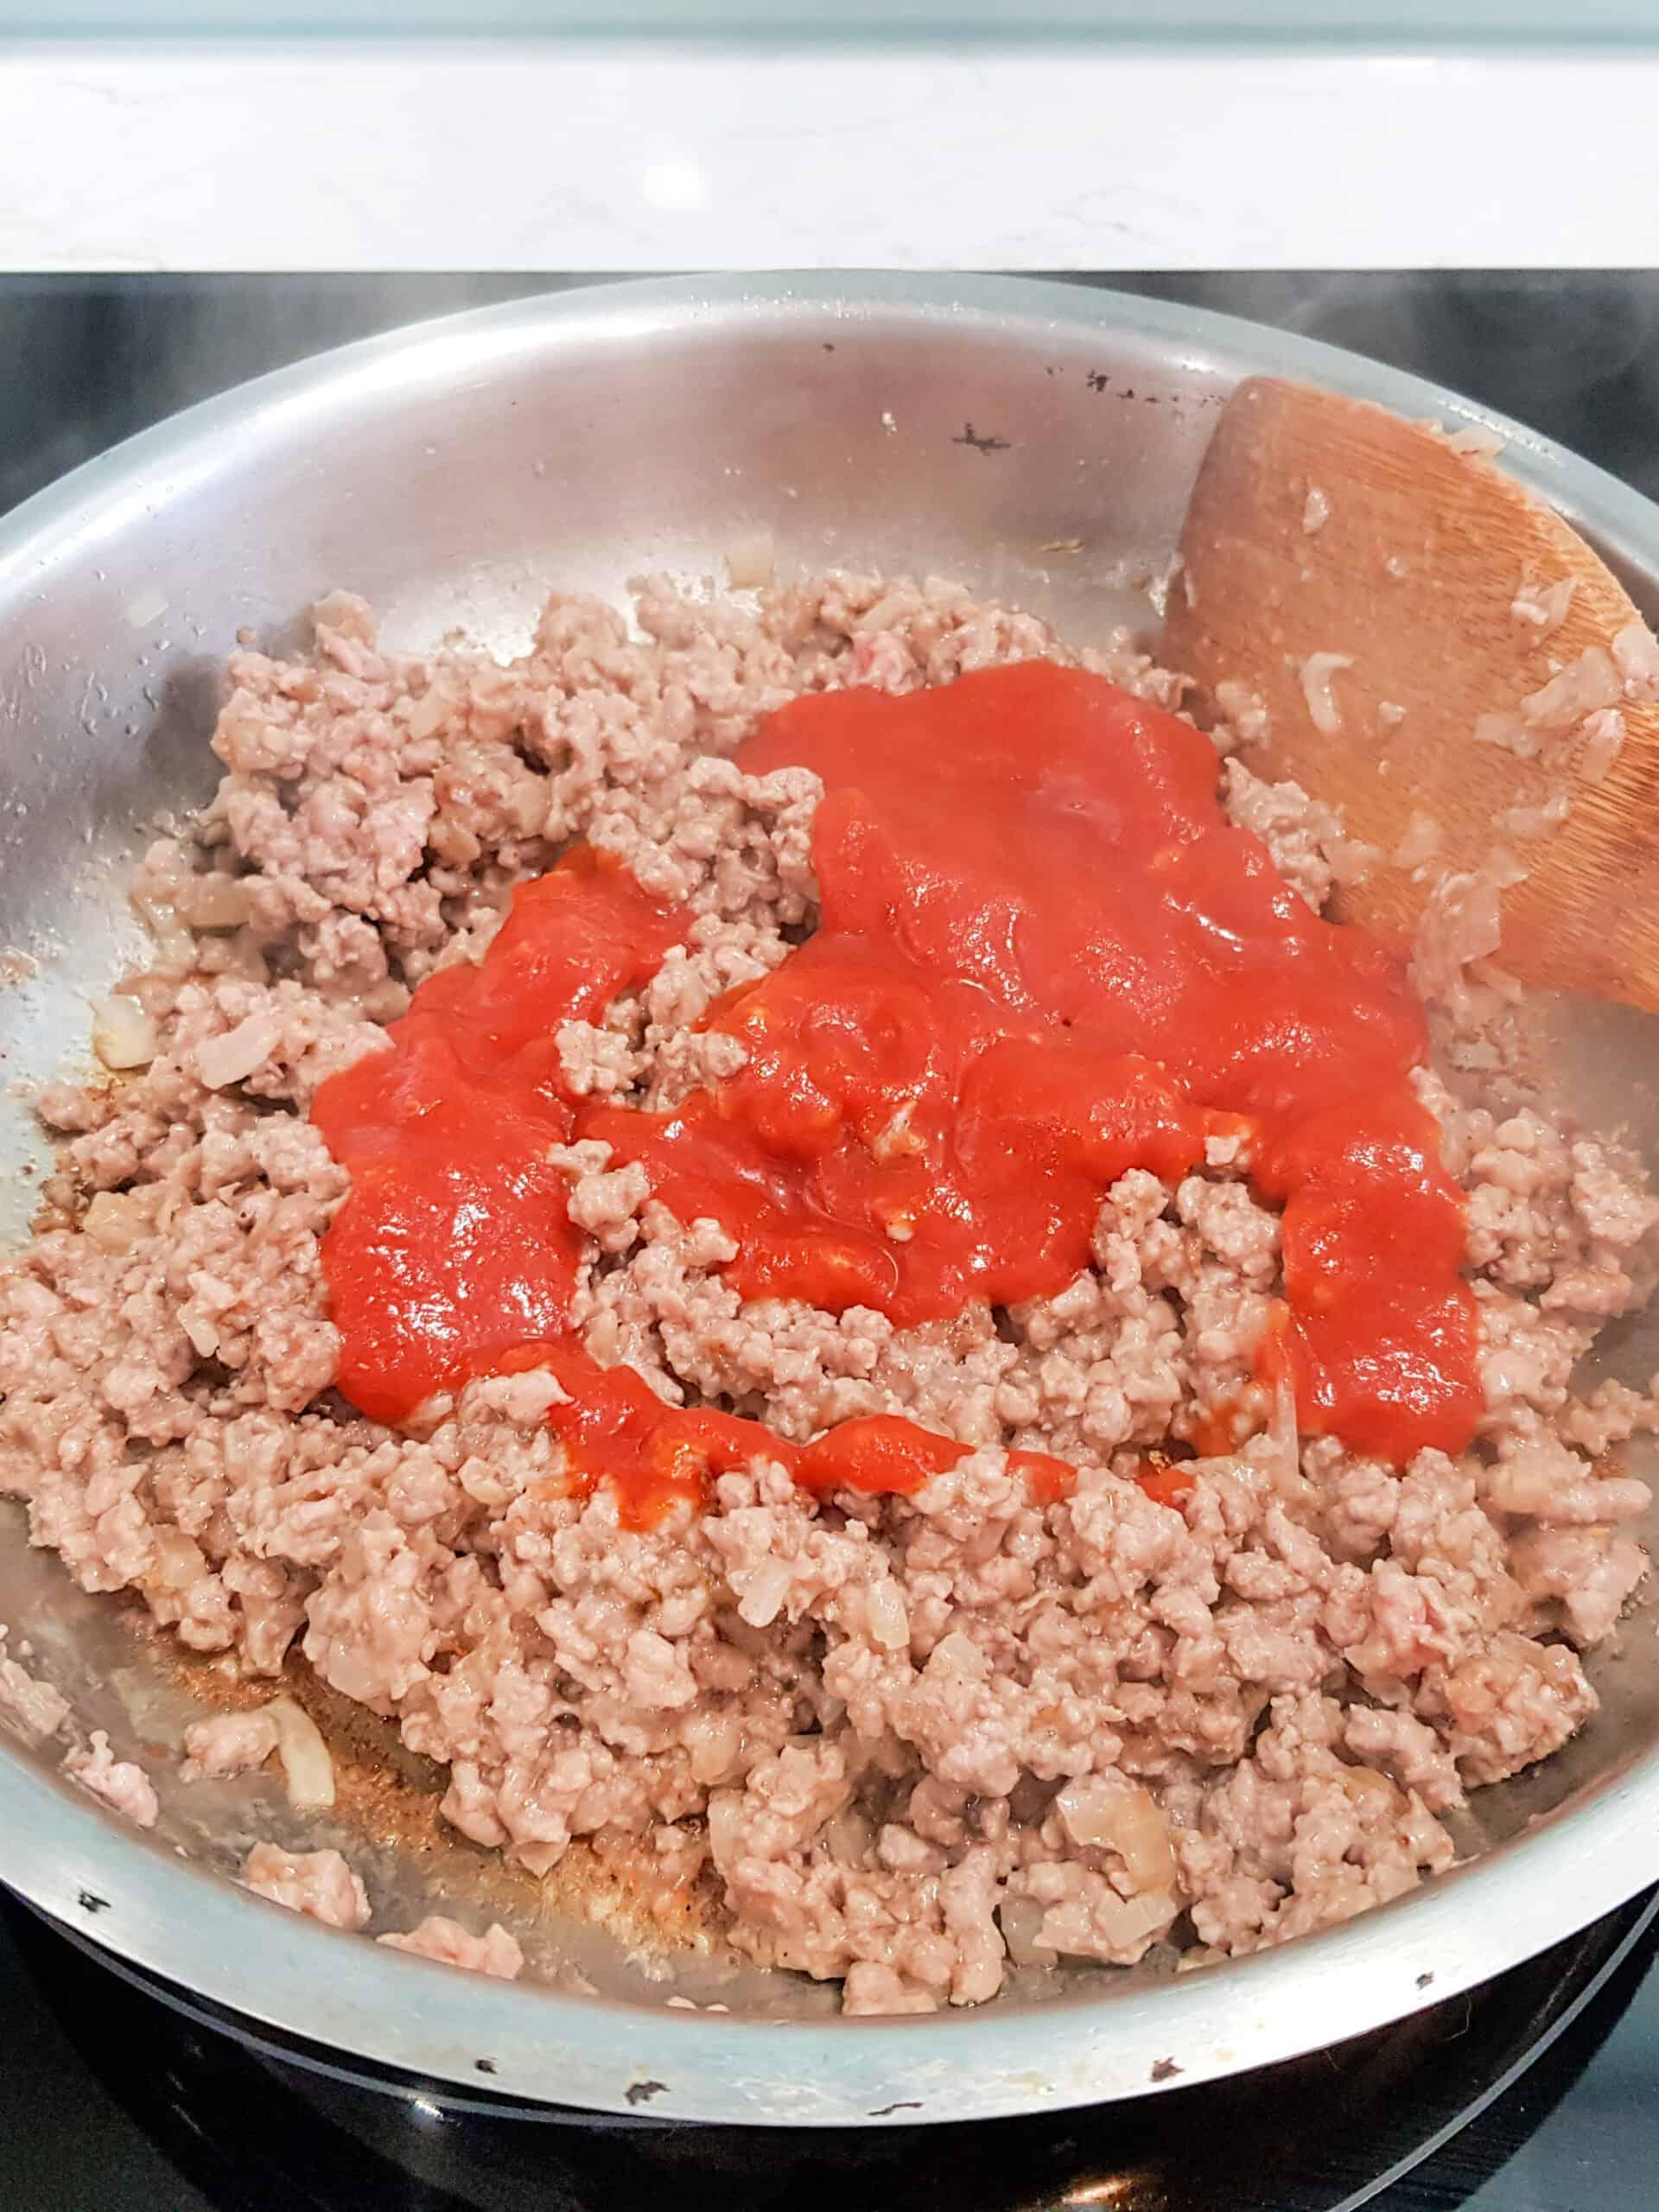 ground beef and tomato sauce